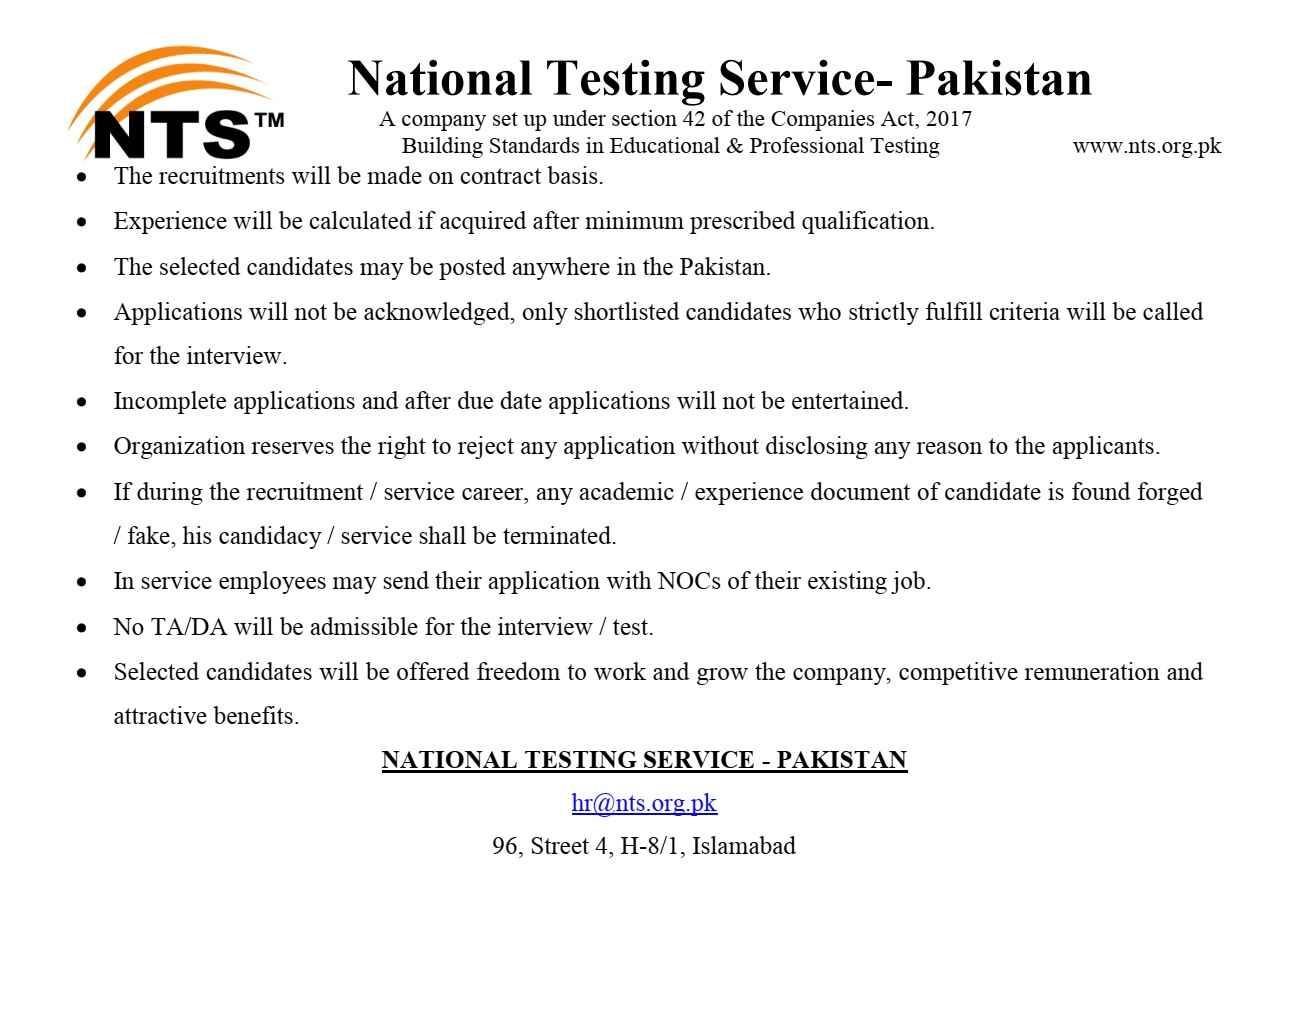 National Testing Service (NTS) - Pakistan Jobs 2021